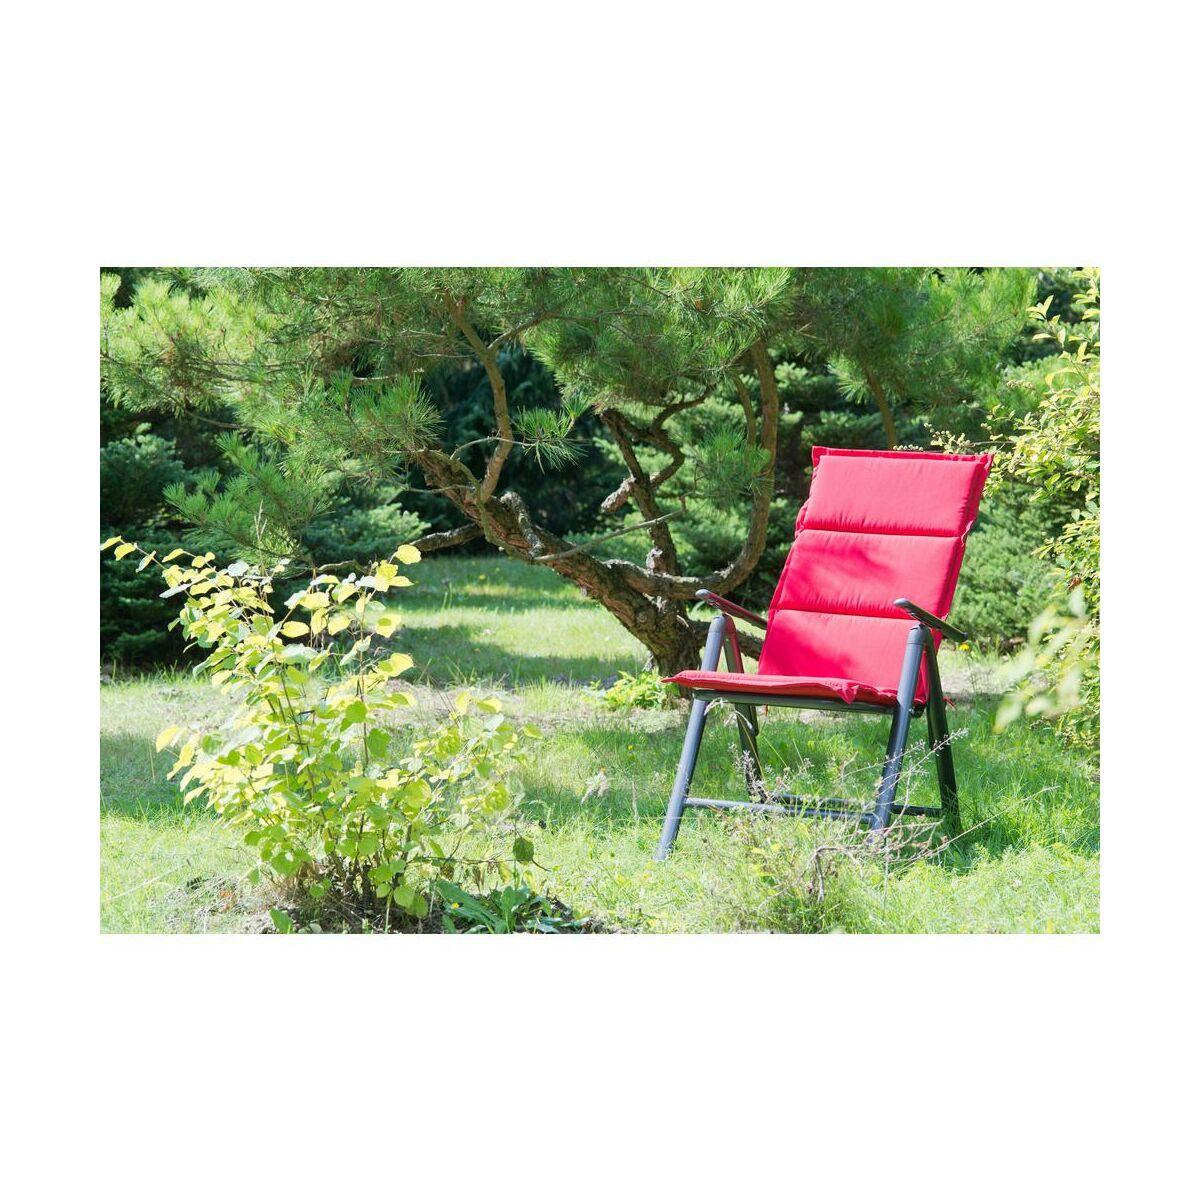 Poduszki Na Meble Ogrodowe Leroy Merlin : Leroy Merlin Ogród Relaks w ogrodzie Meble ogrodowe Poduszki do mebli